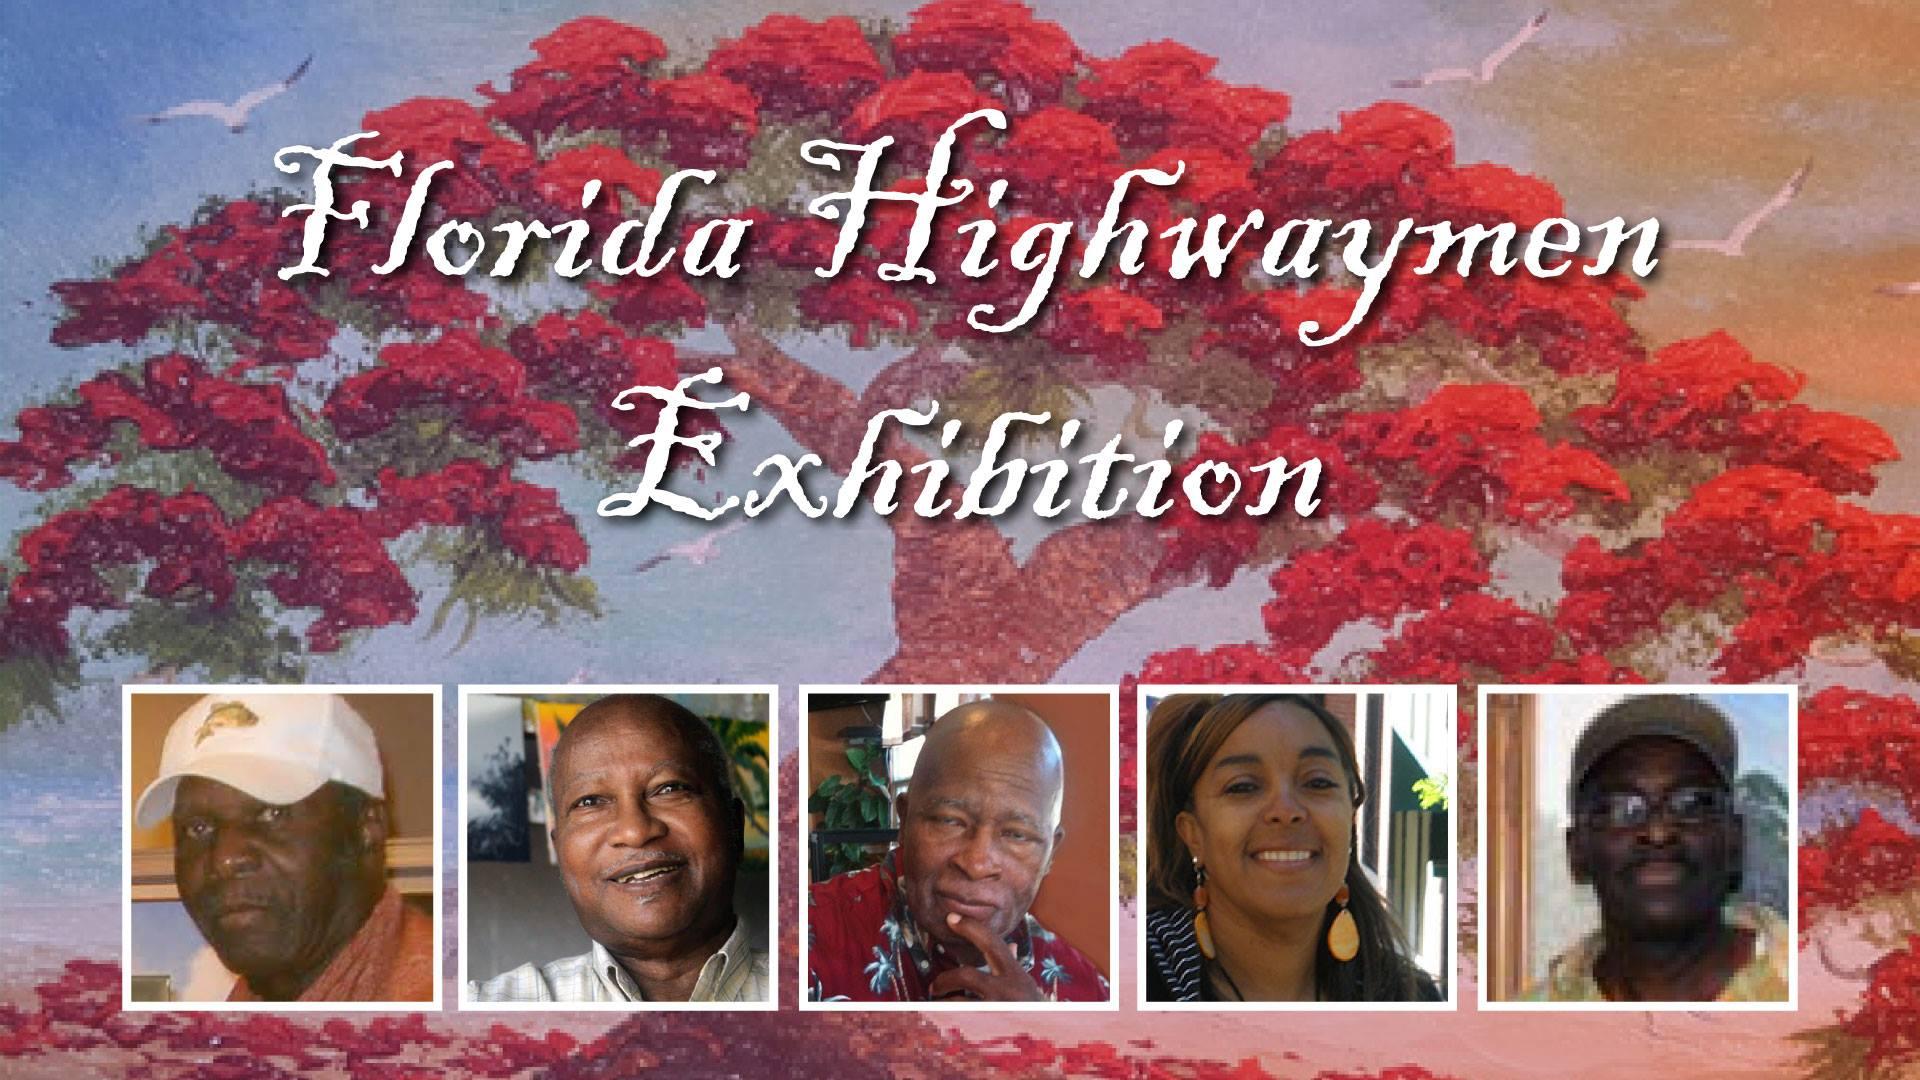 Florida's Original and 2nd Generation Highwaymen Artists